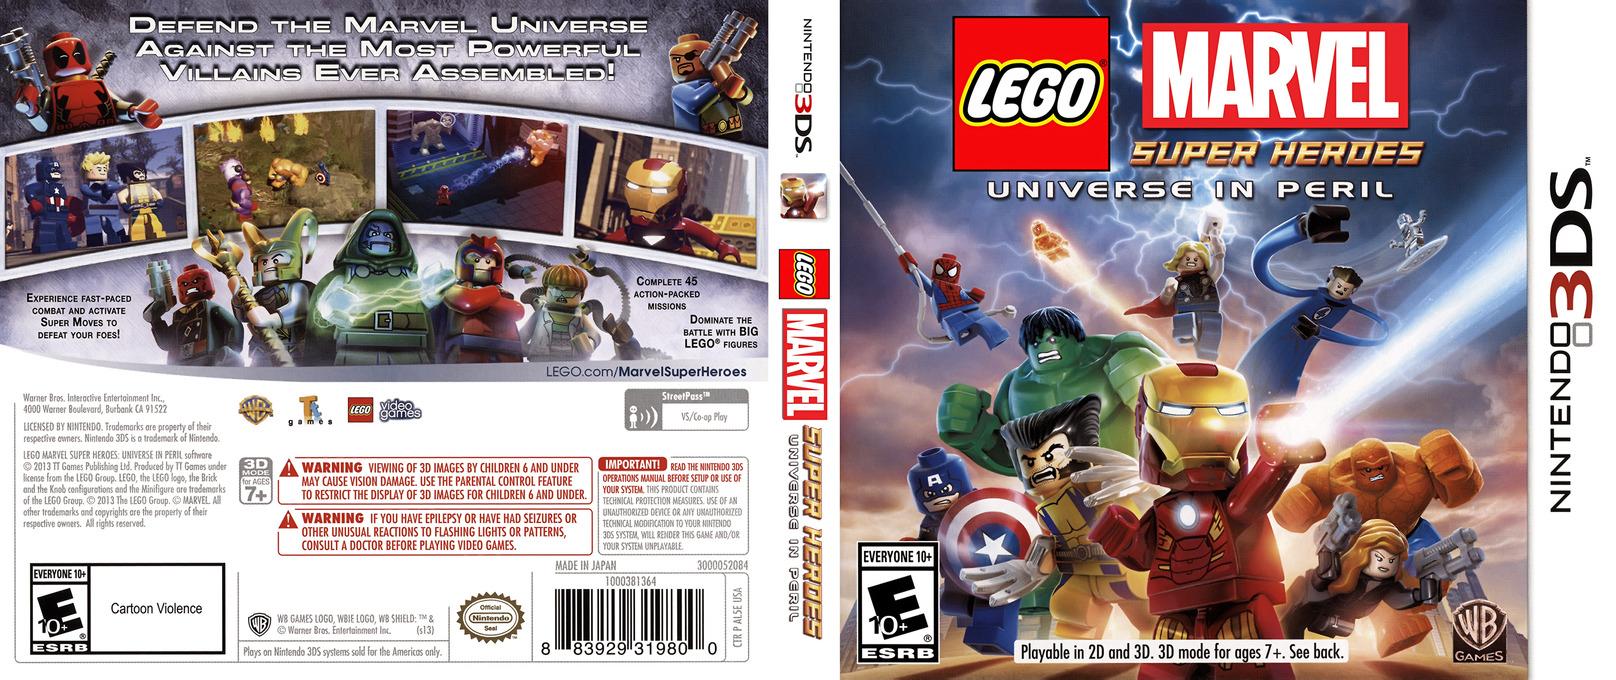 LEGO Marvel Super Heroes - Universe in Peril 3DS coverfullHQ (AL5E)